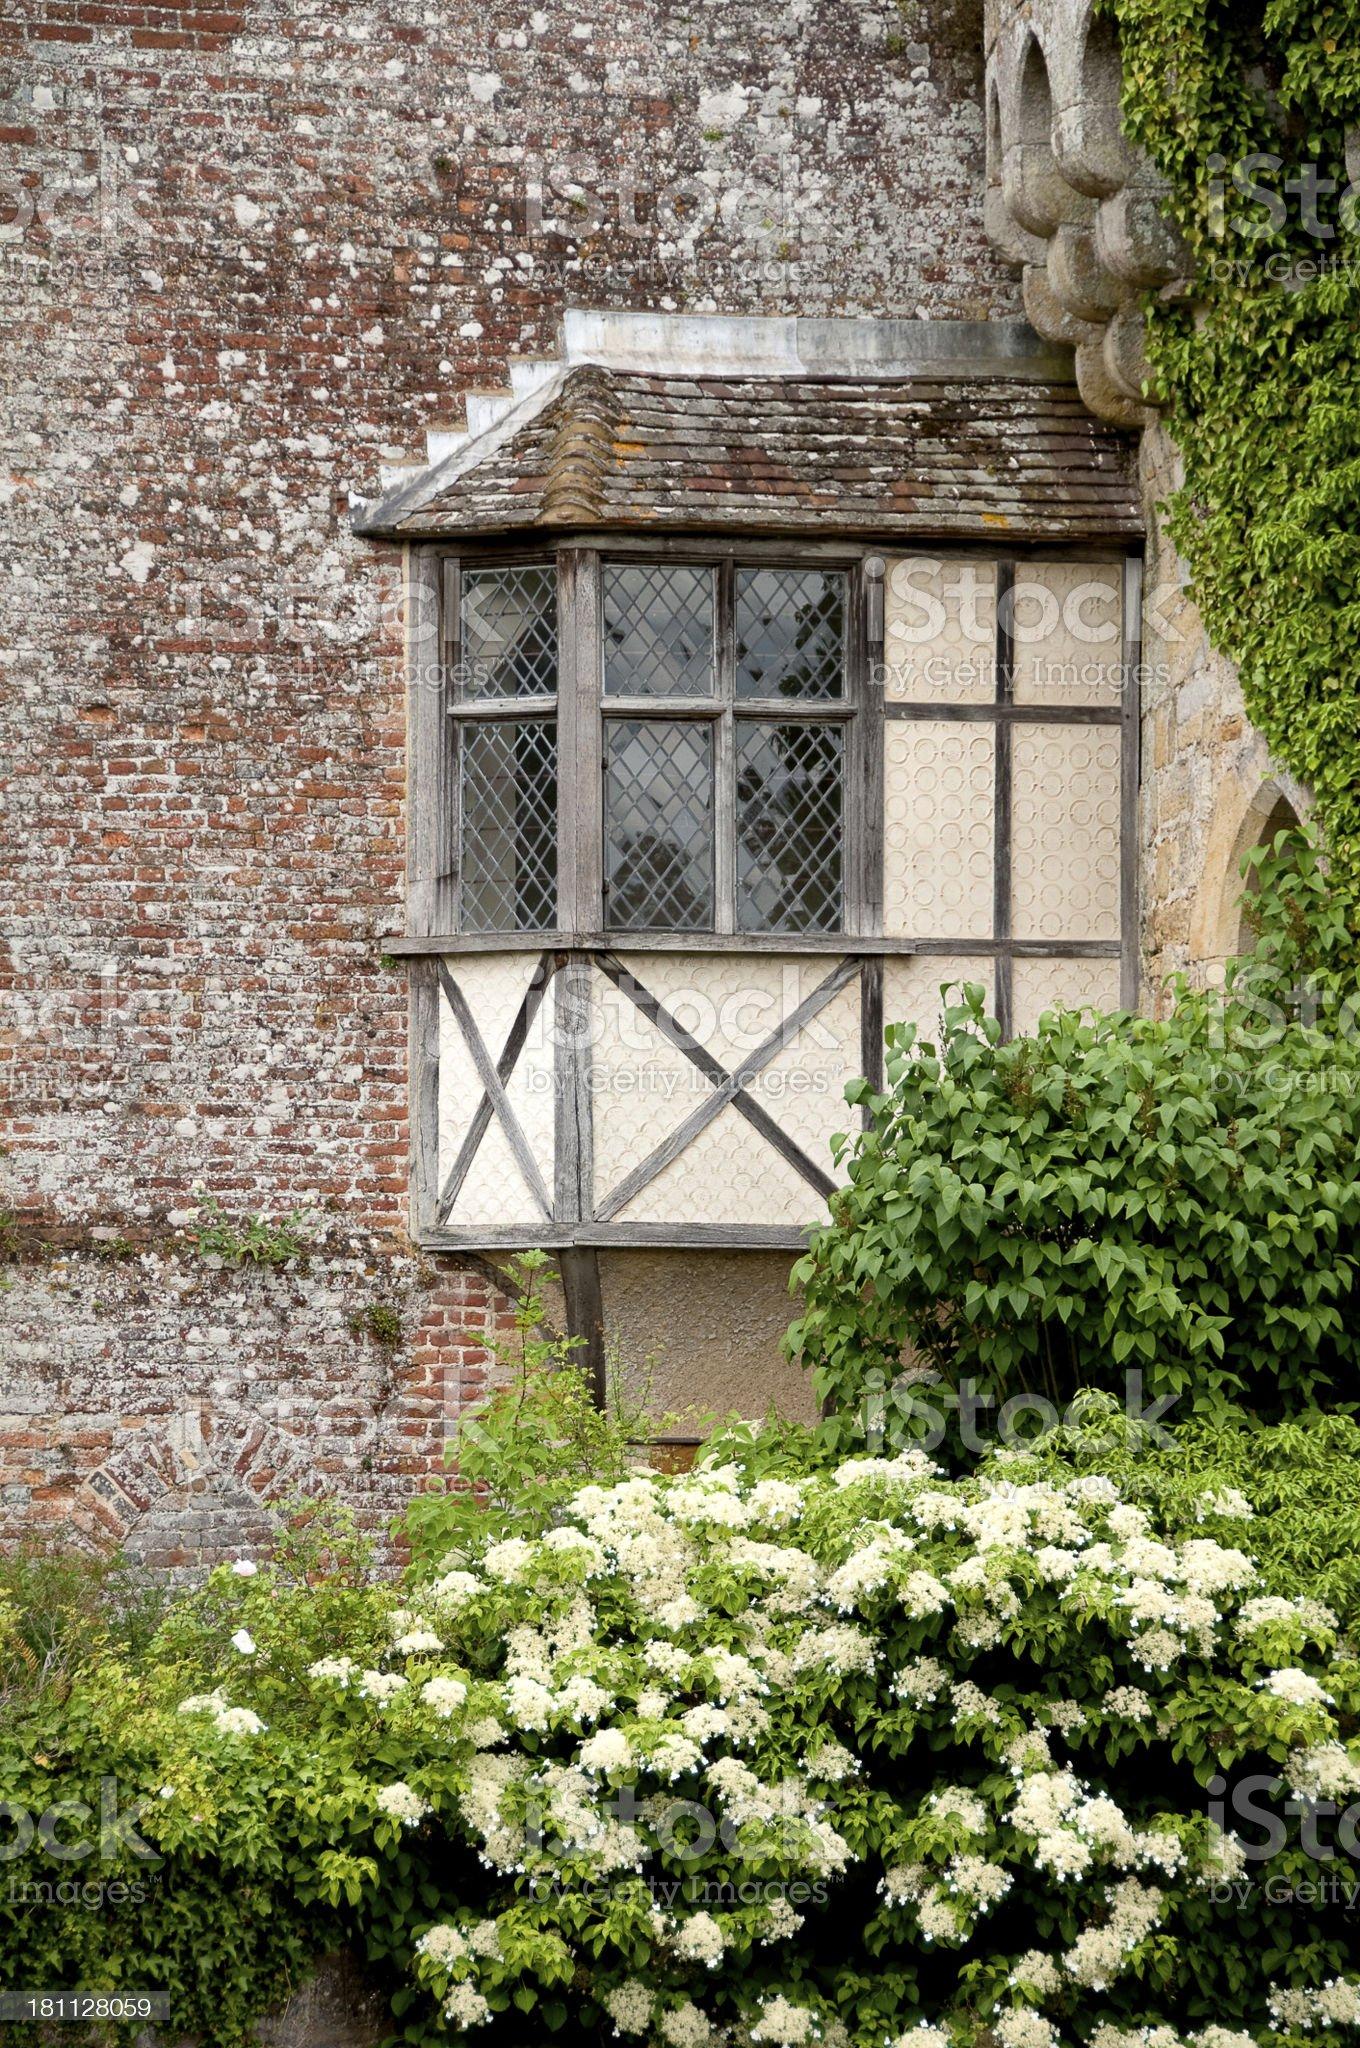 Ancient window - Scotney Castle, Kent, UK royalty-free stock photo